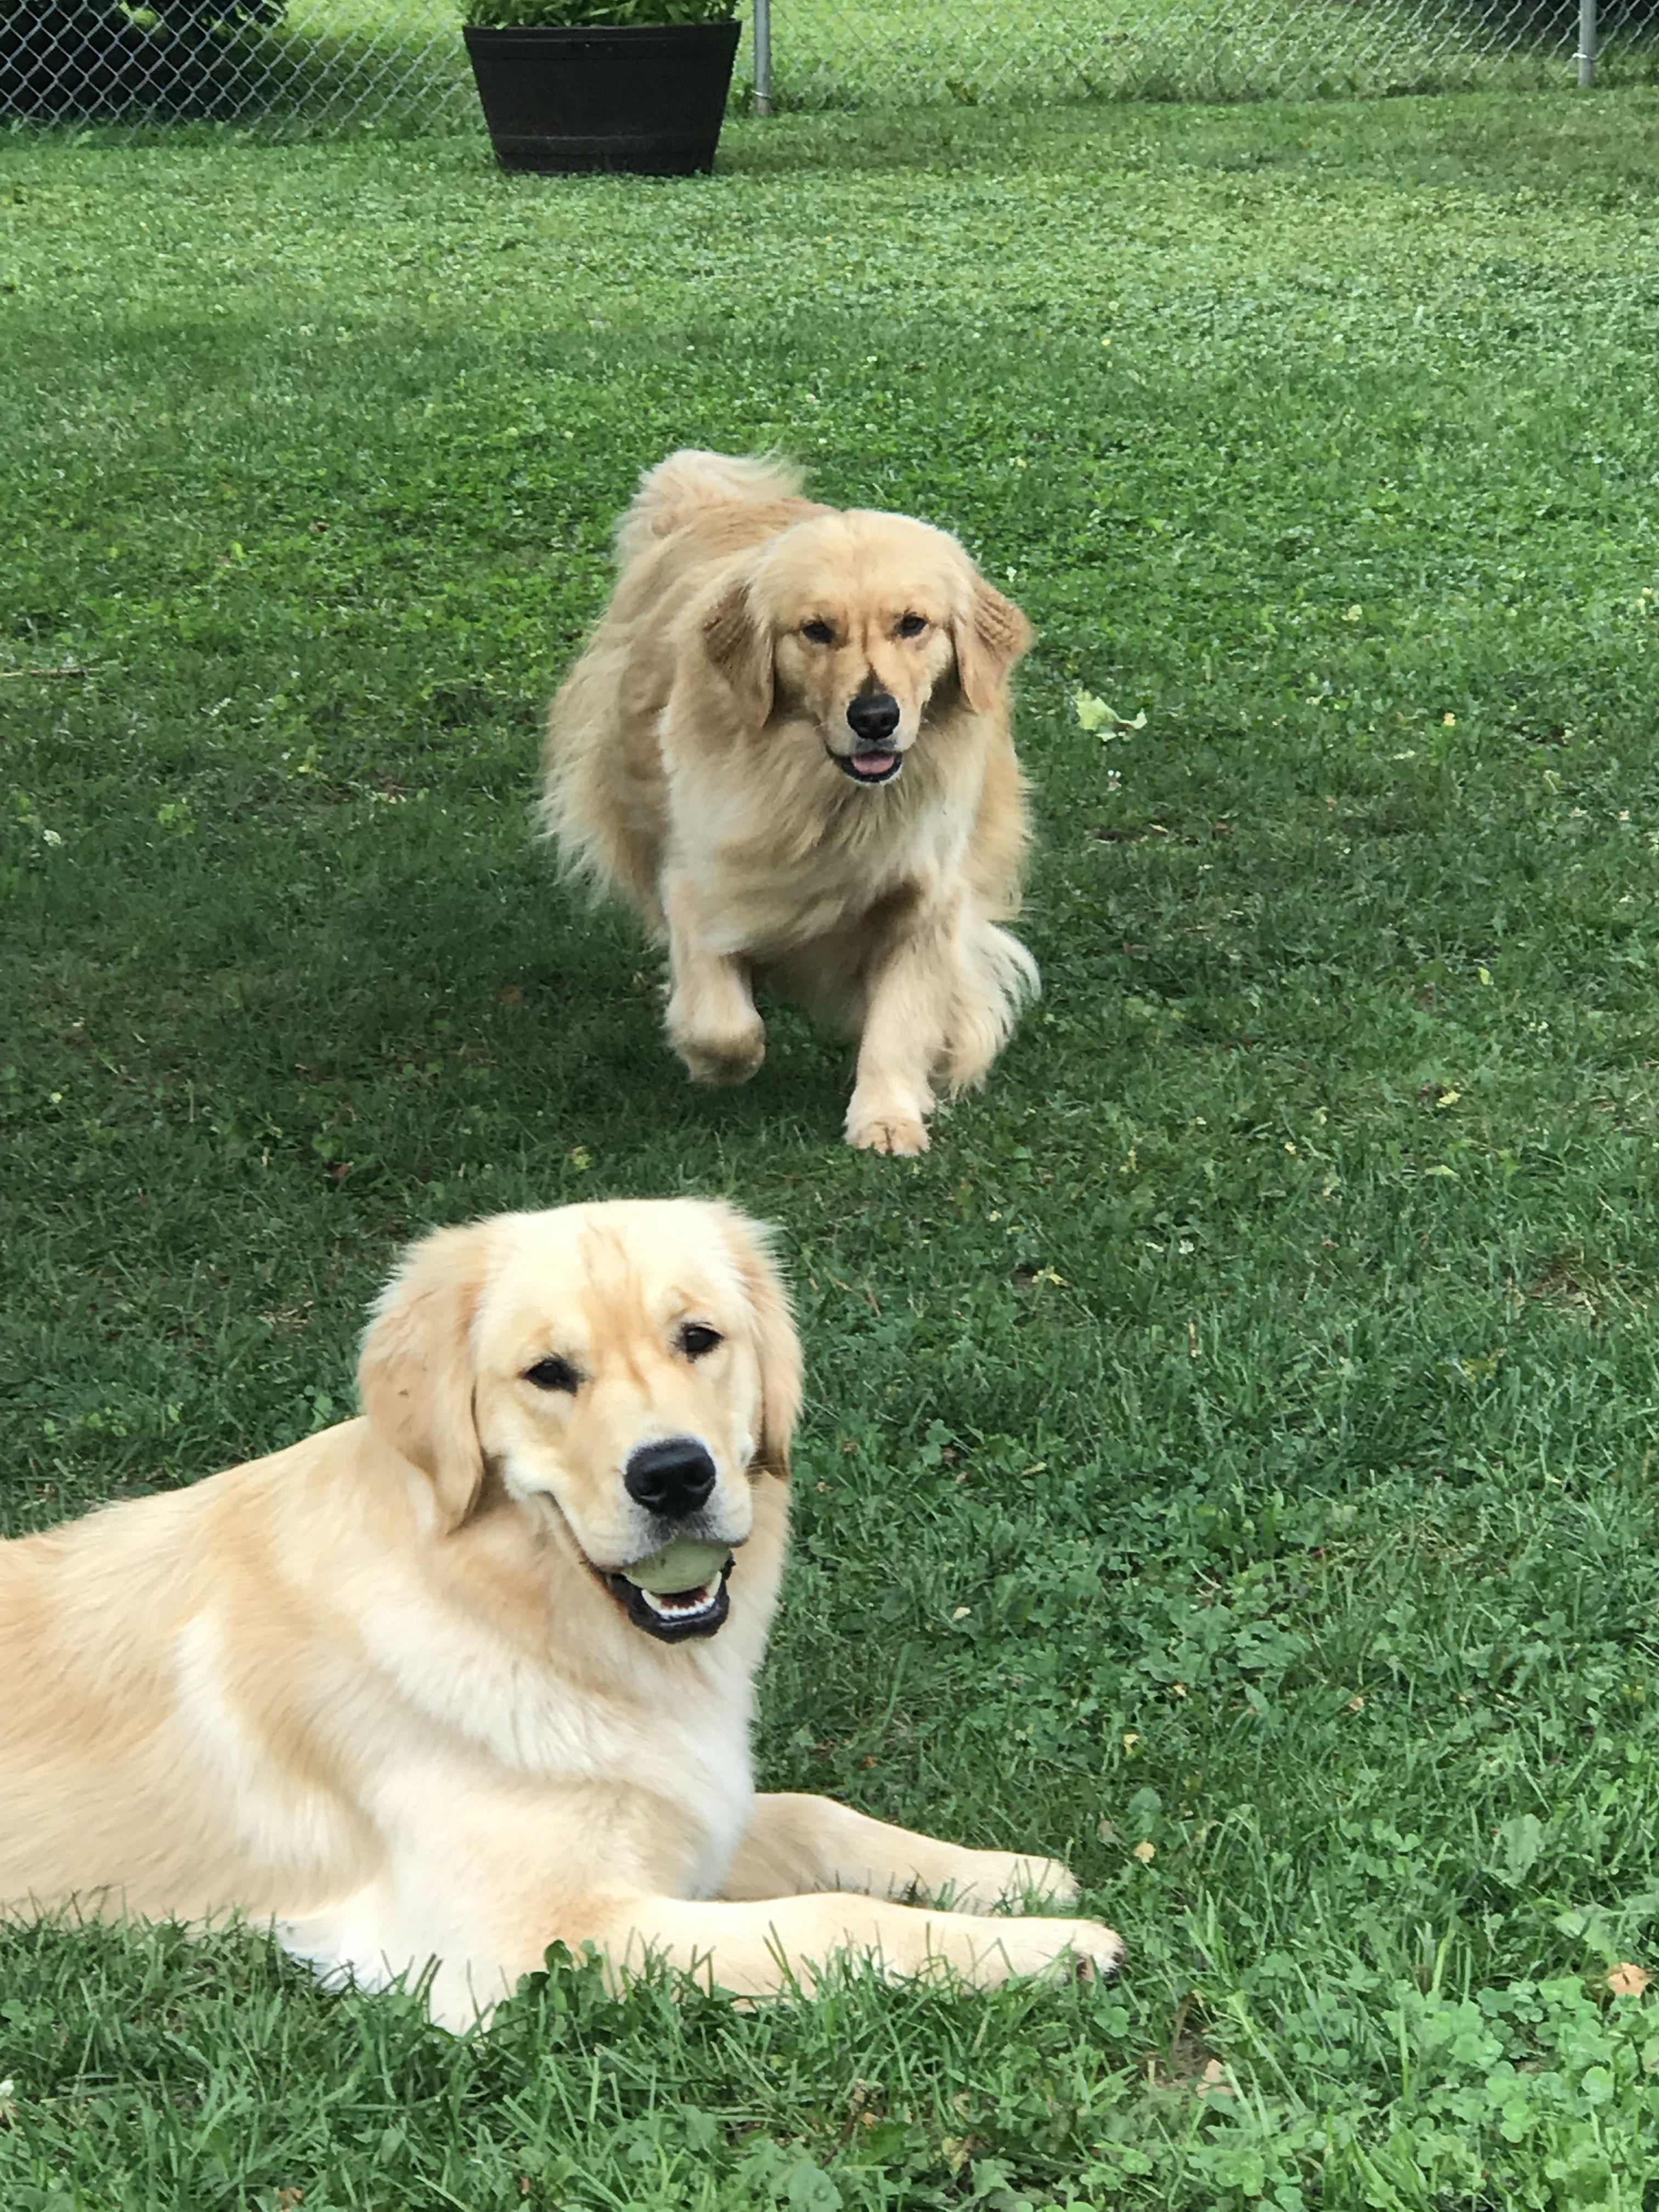 Pin By Paula Vankuiken On Goldens Golden Dog Cute Animals Dogs